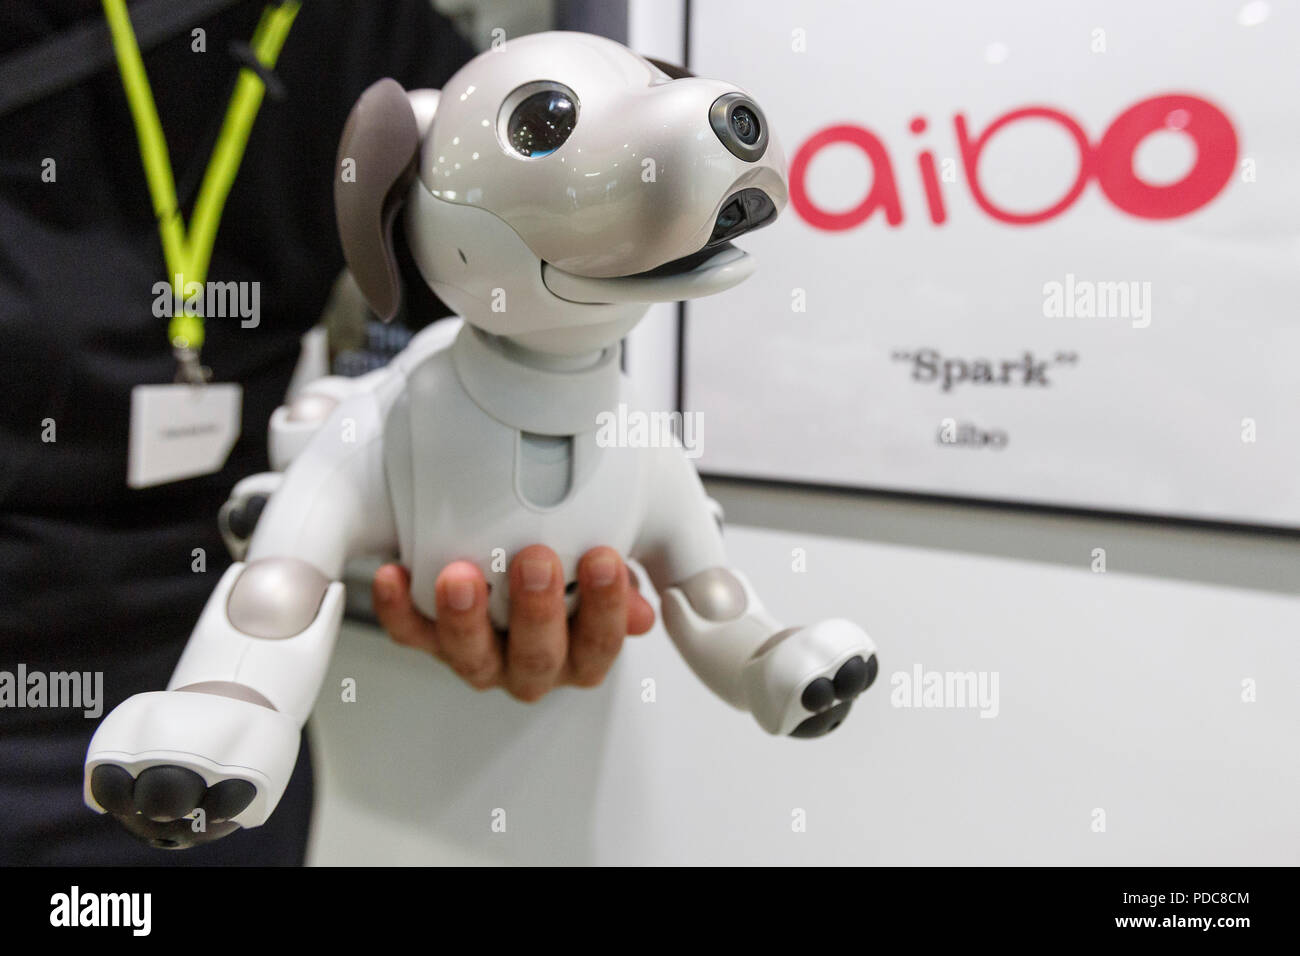 Robot Dog Sony Stock Photos & Robot Dog Sony Stock Images